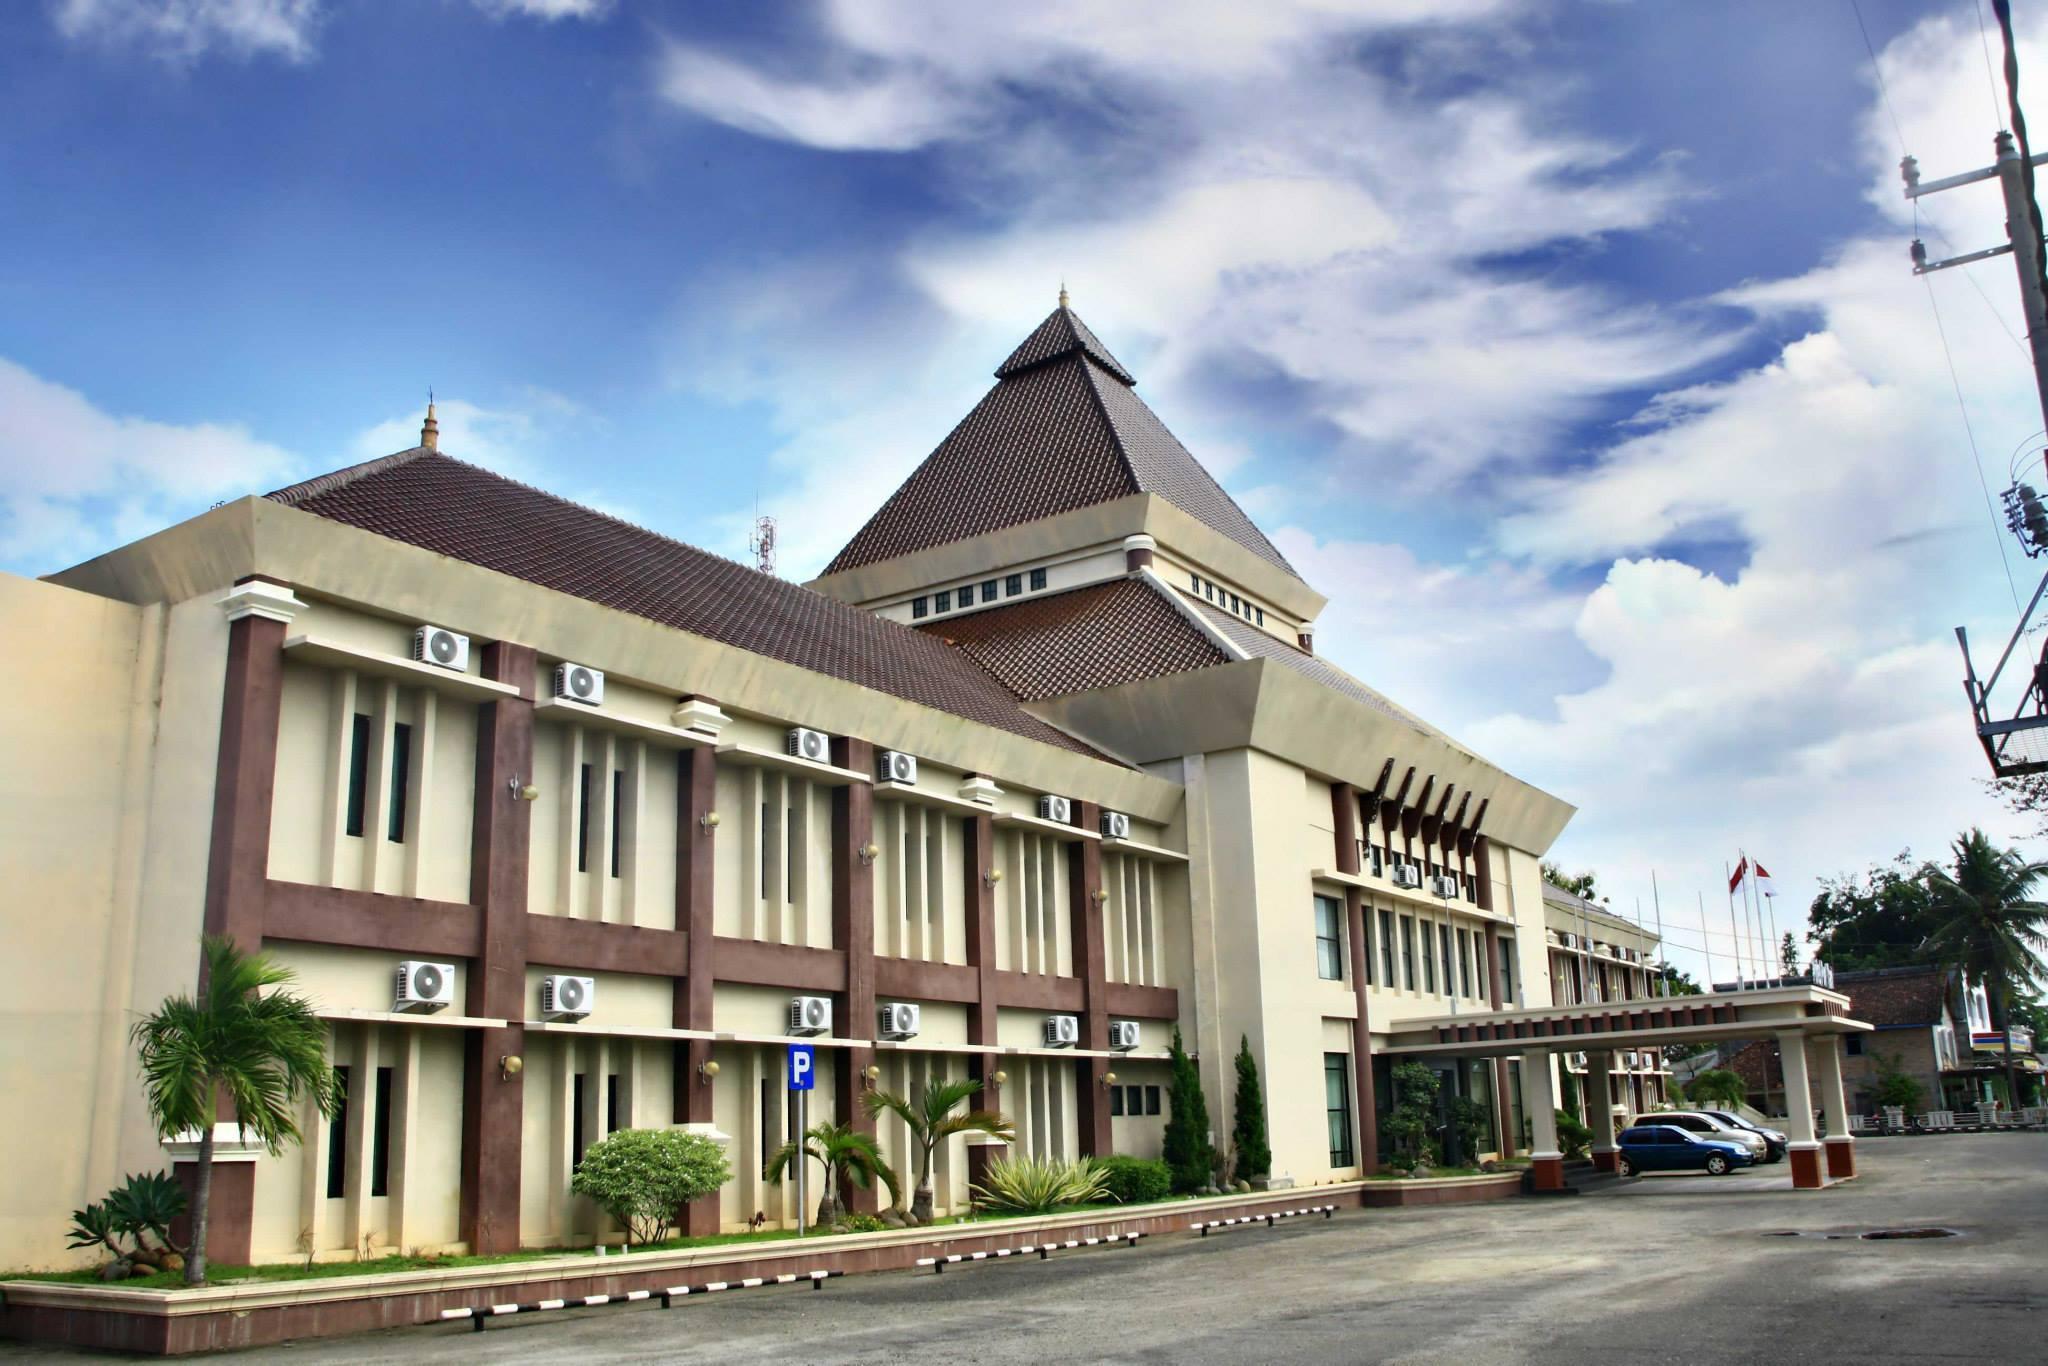 Hotel Parai Puri Tani, Ogan Komering Ulu Timur